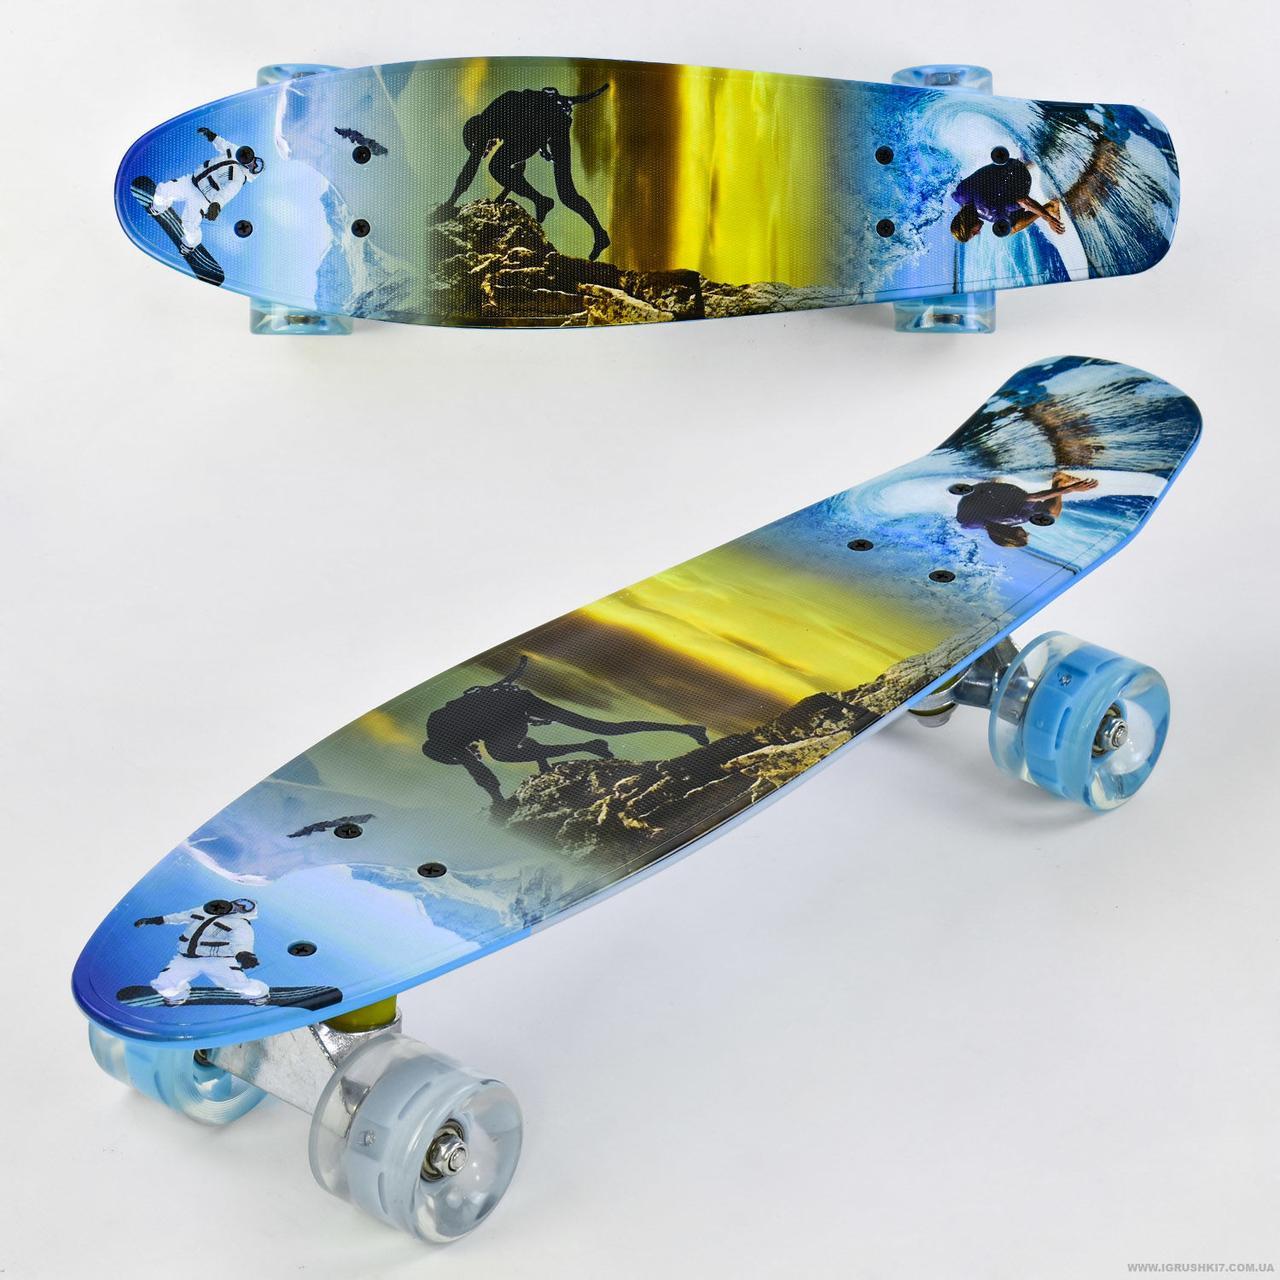 Скейт F 3270  Best Board, доска=55см, колёса PU, СВЕТЯТСЯ, d=6см